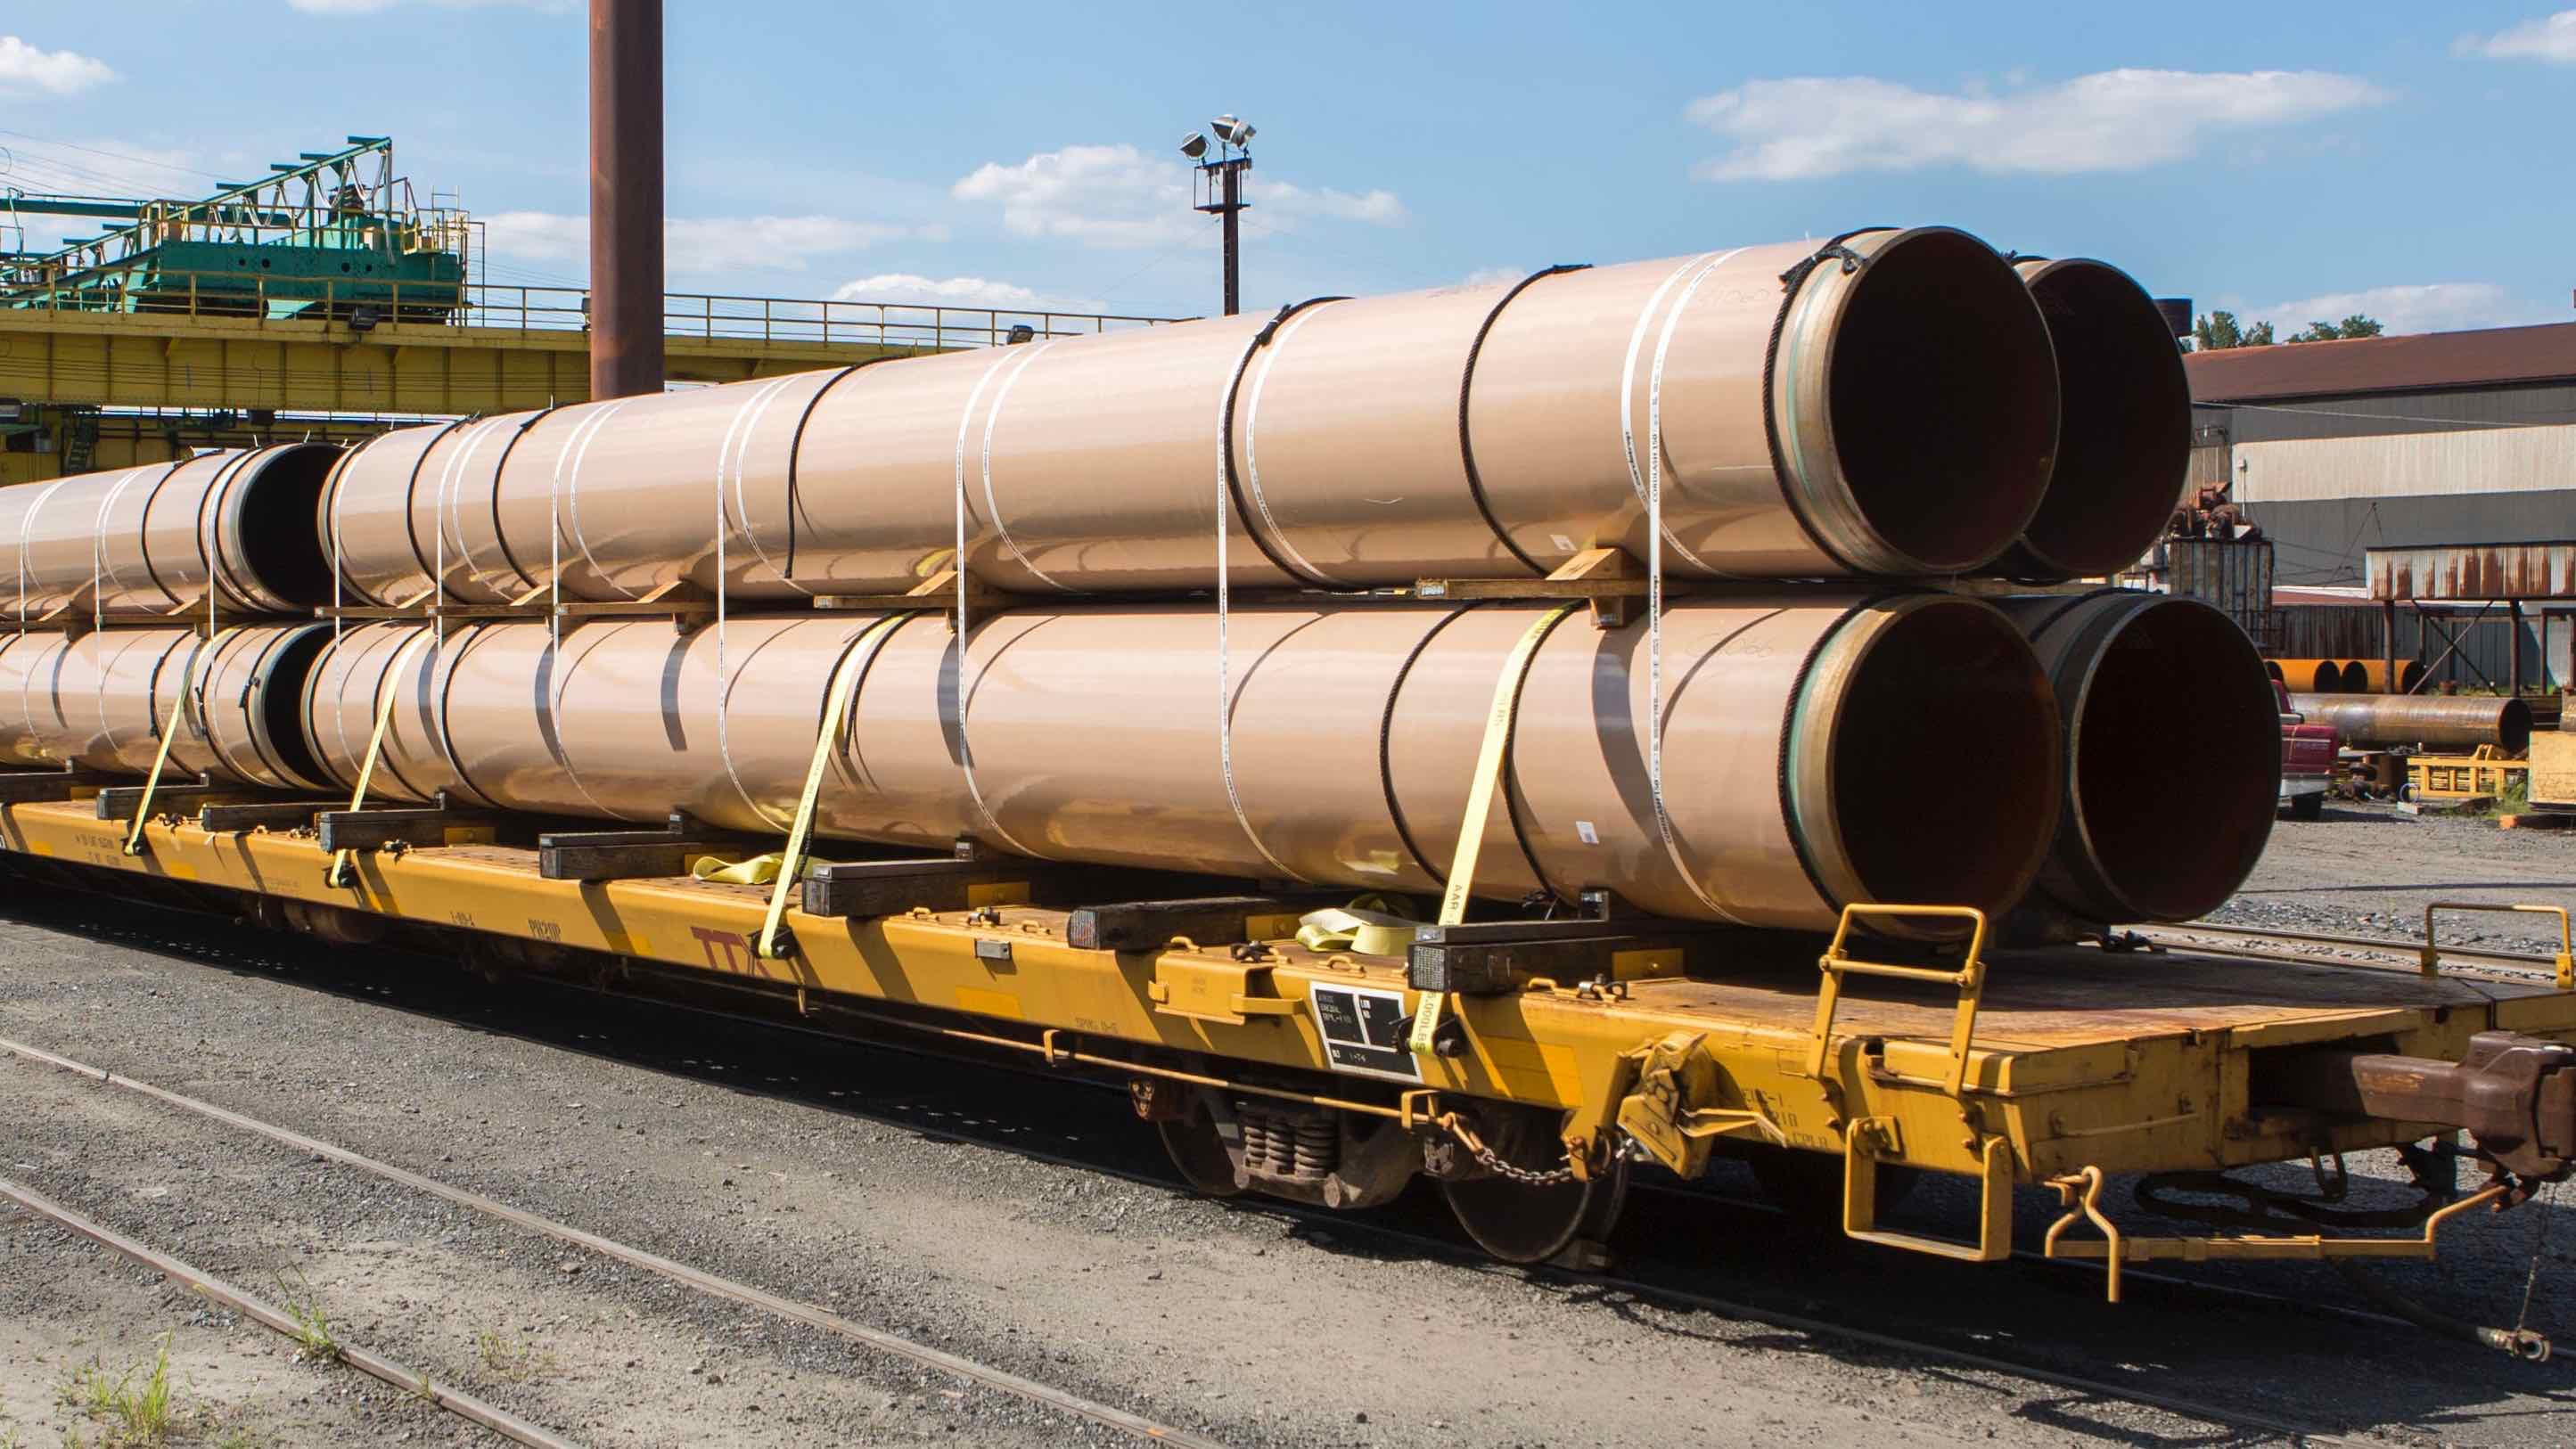 Atlantic Coast Pipeline Natural Gas Compressor Stations